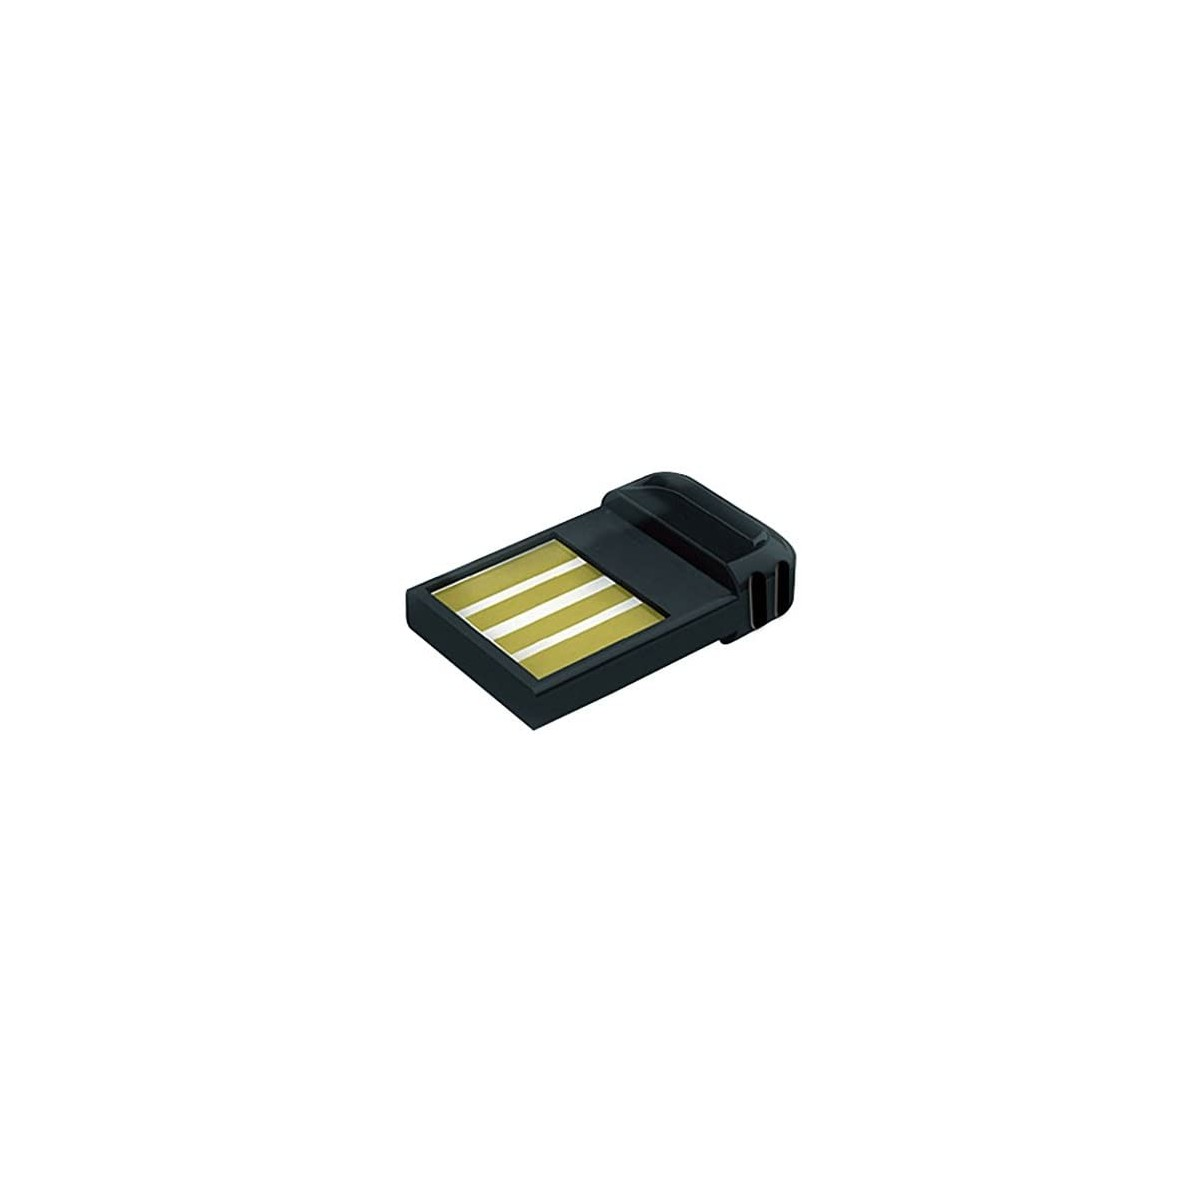 Yealink BT40 Bluetooth USB Dongle